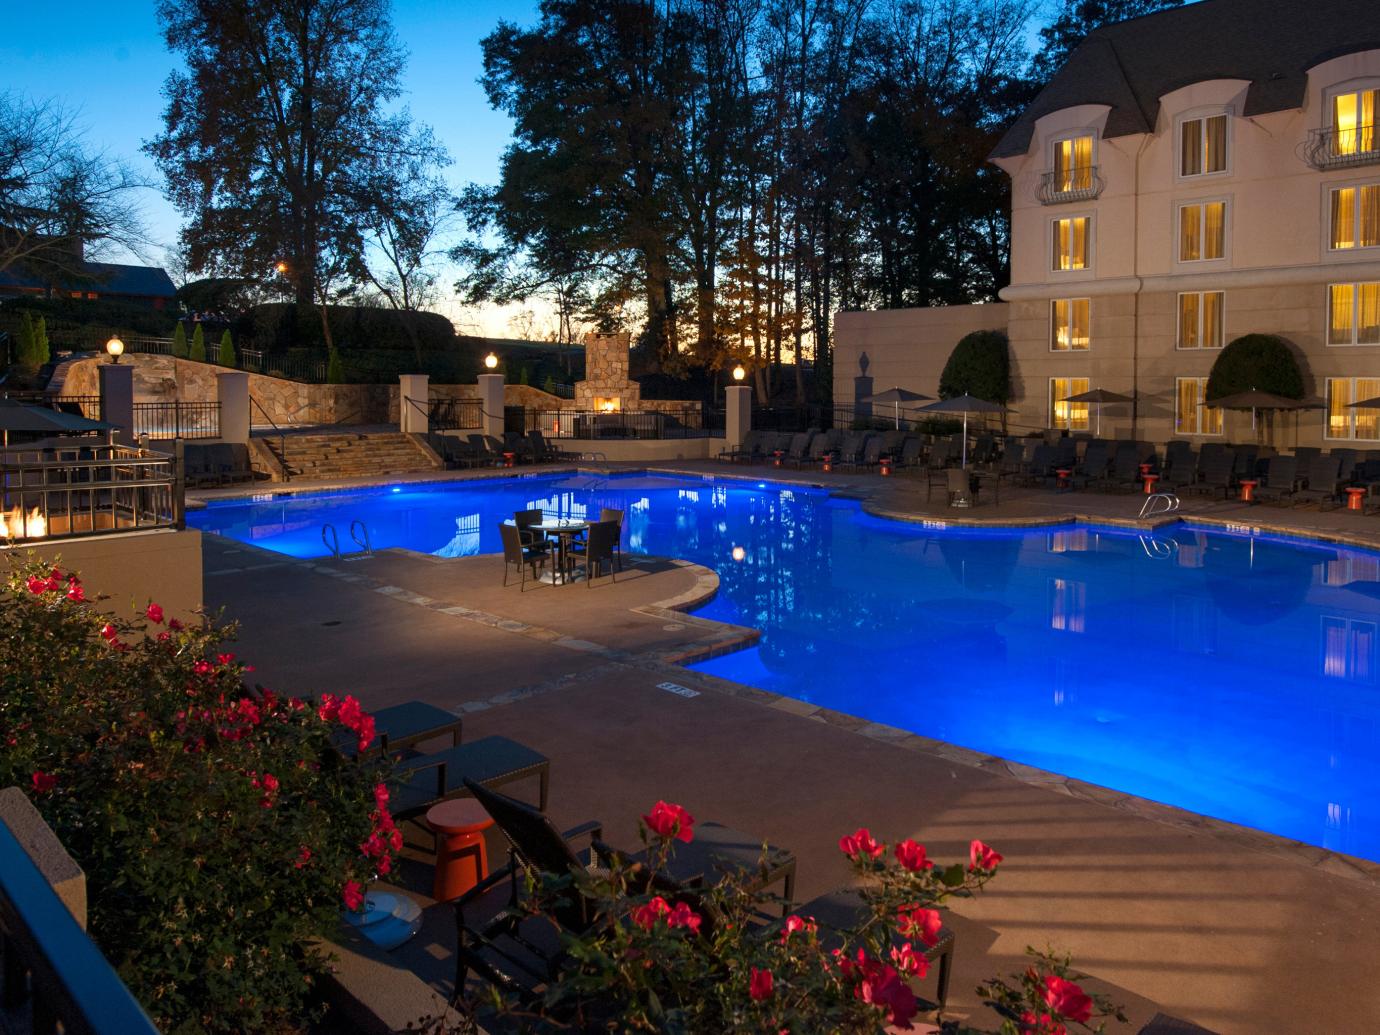 Outdoor swimming pool at night at Chateau Elan Winery & Resort